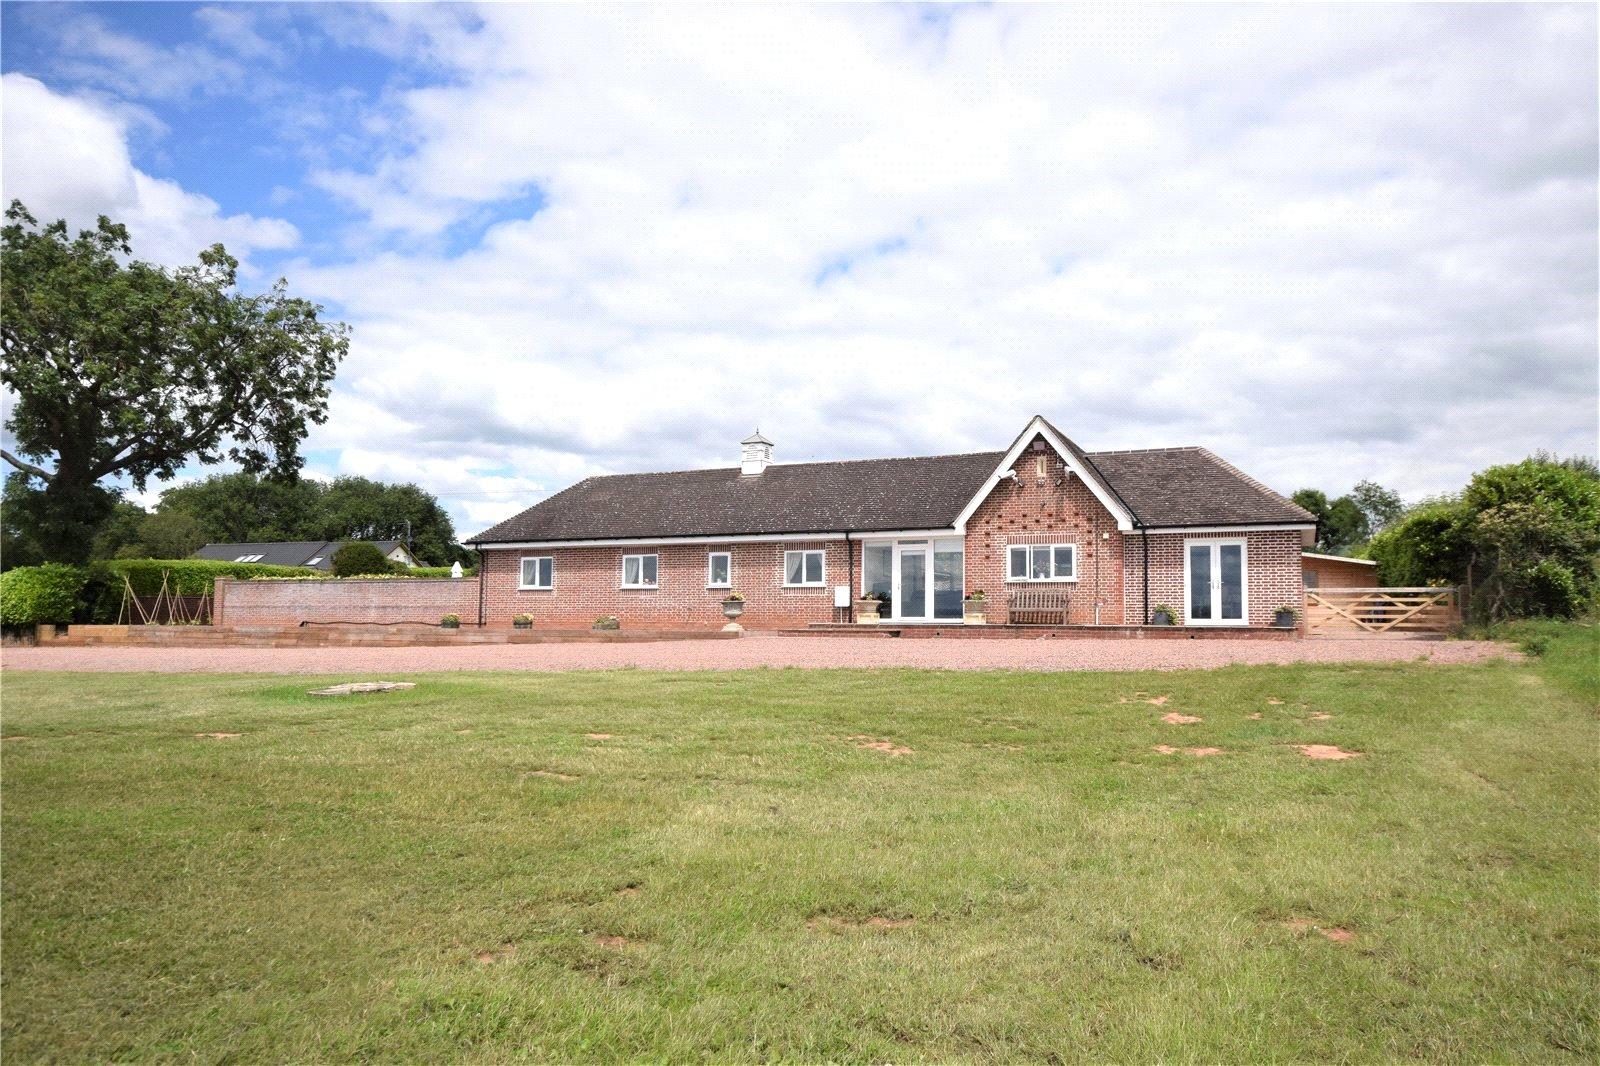 Apple Cross Lodge, Alveley, Bridgnorth, Shropshire, WV15